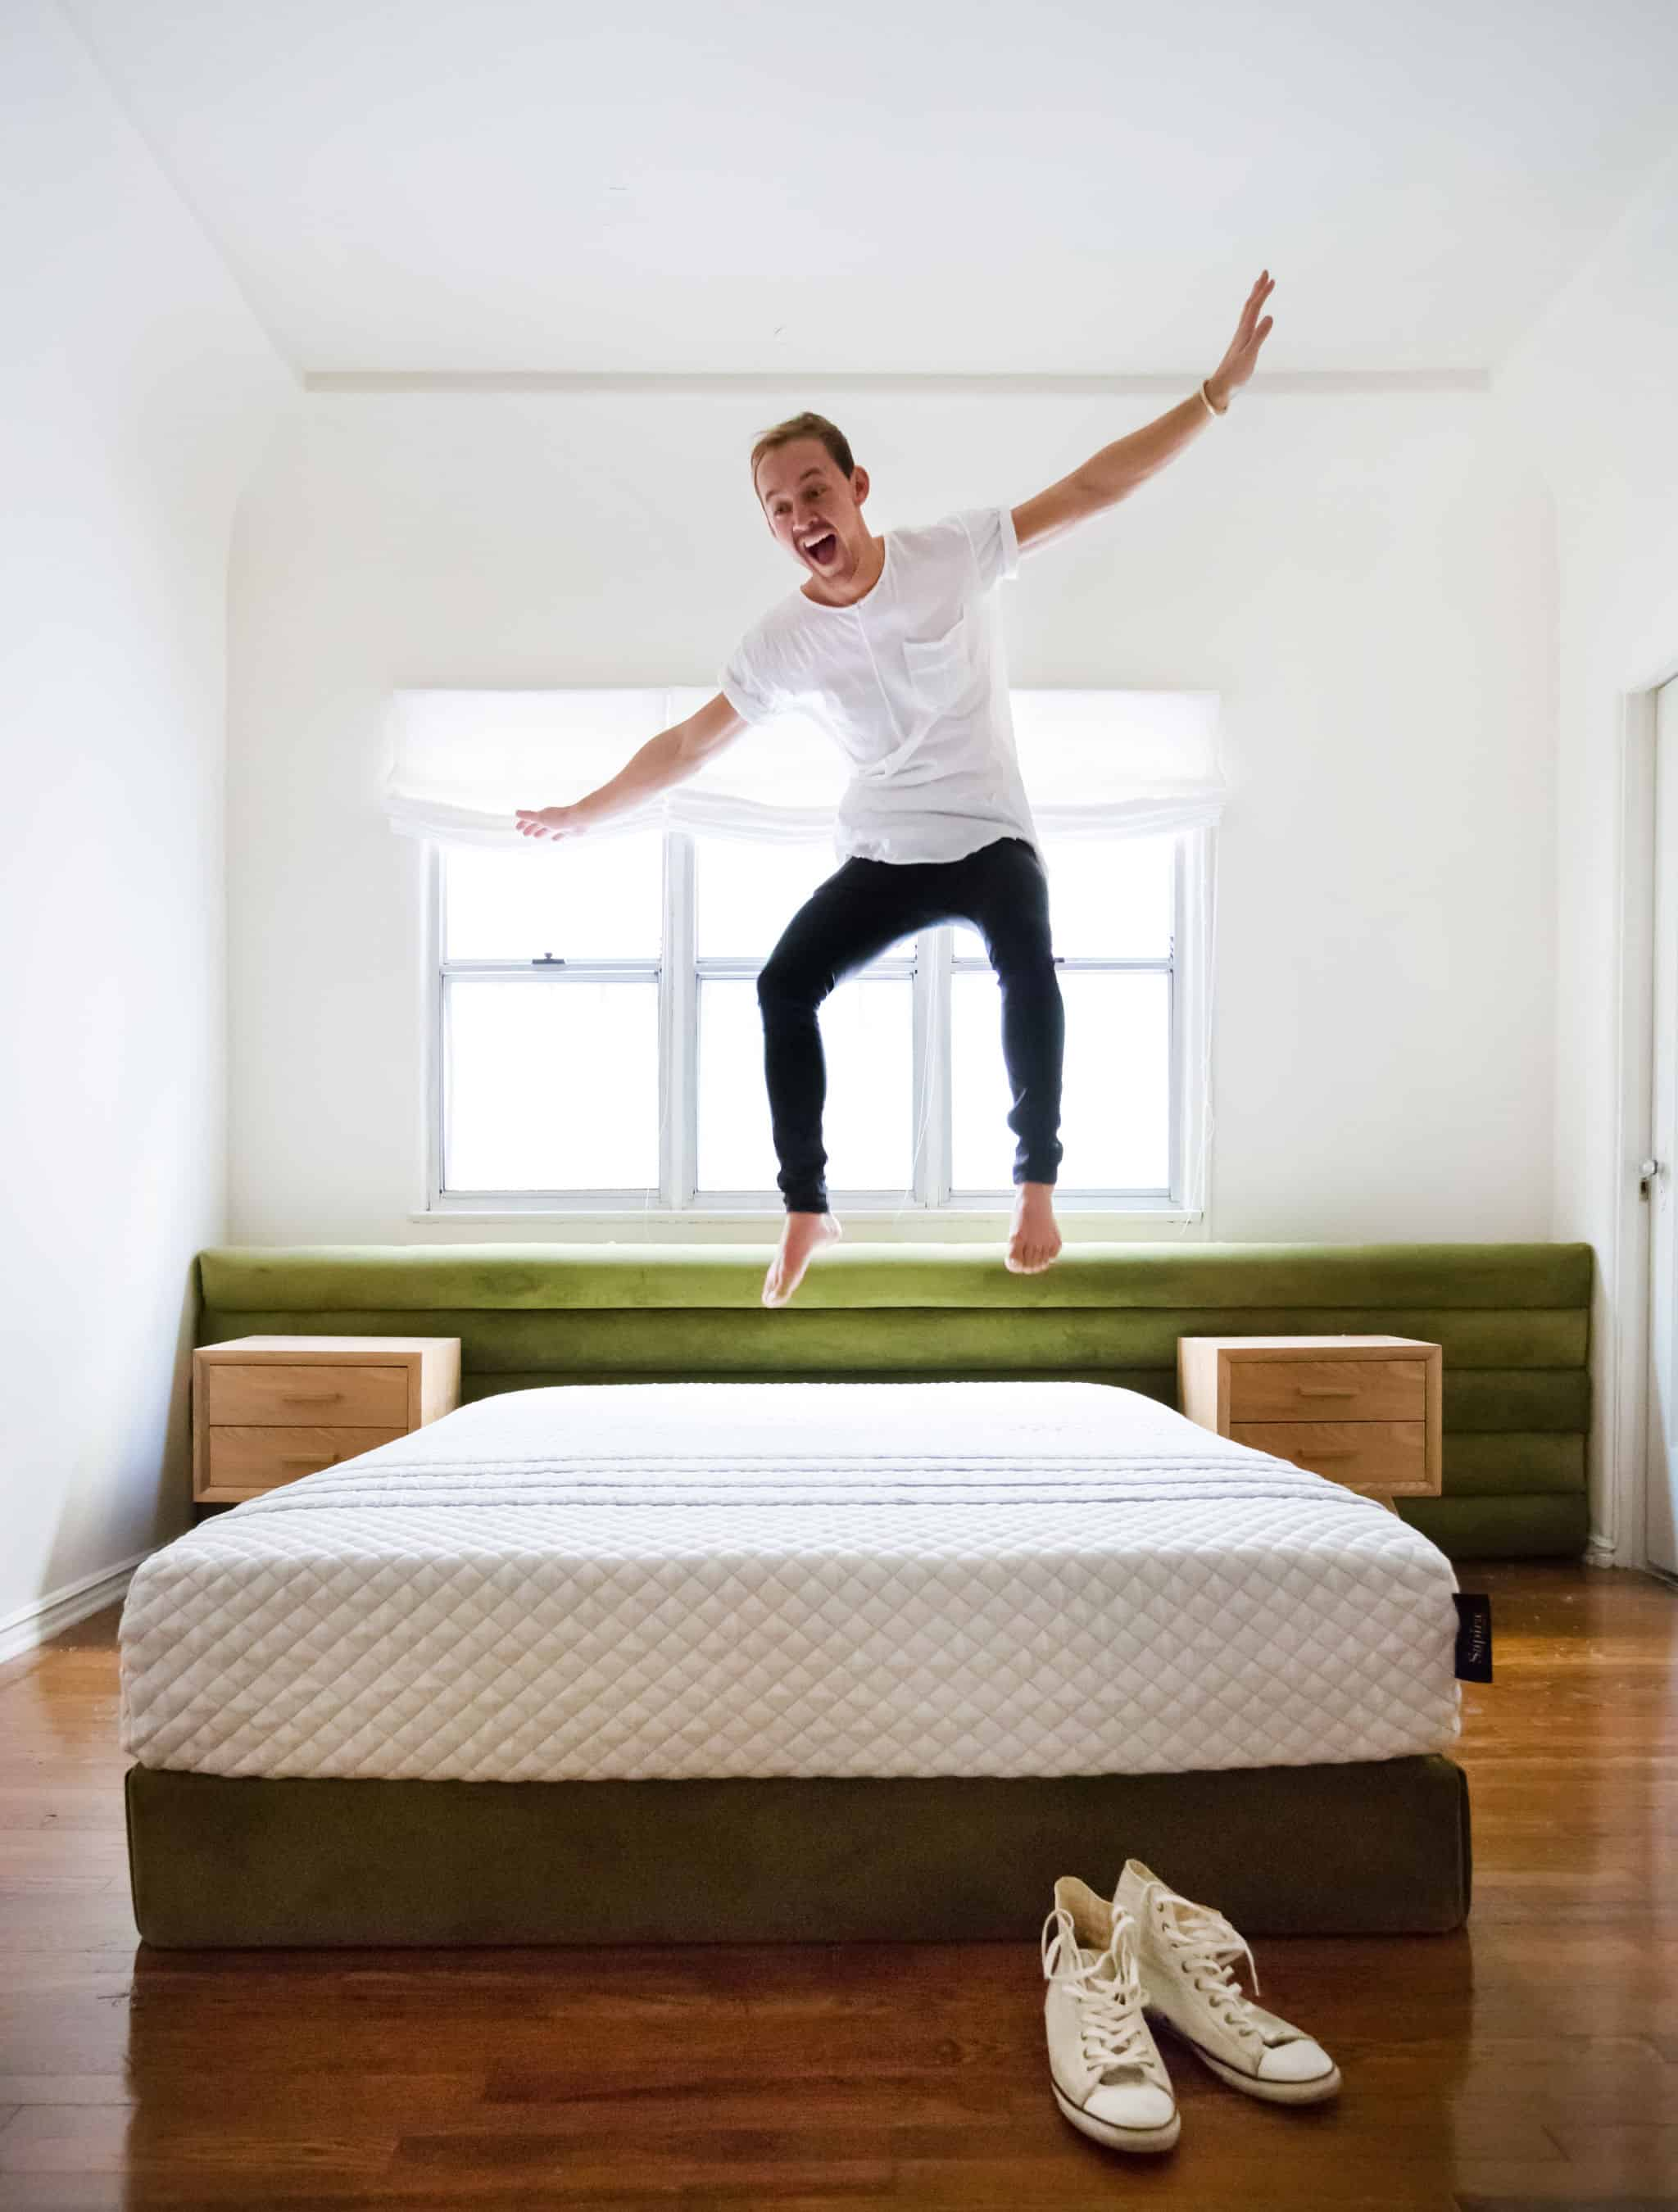 emily-henderson_sapira-mattress_diy-headboard_brady-tolbert_bedroom_green-velvet_channel-tufting_channel-tufted_masculine_boho_chic_headboard_3